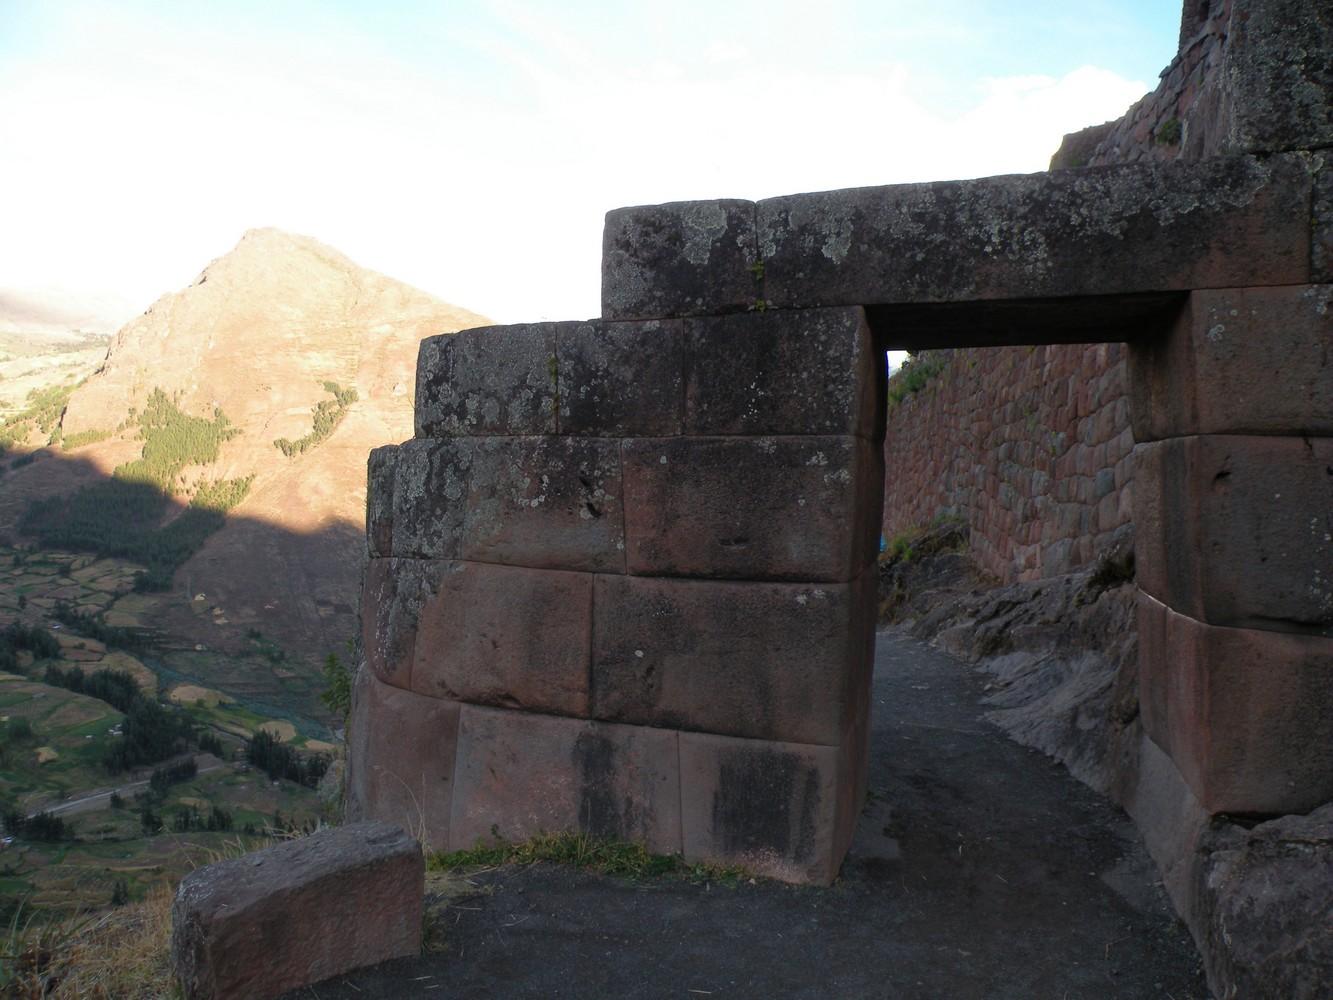 Ruines de Pisaq - Puerta del Serpiente